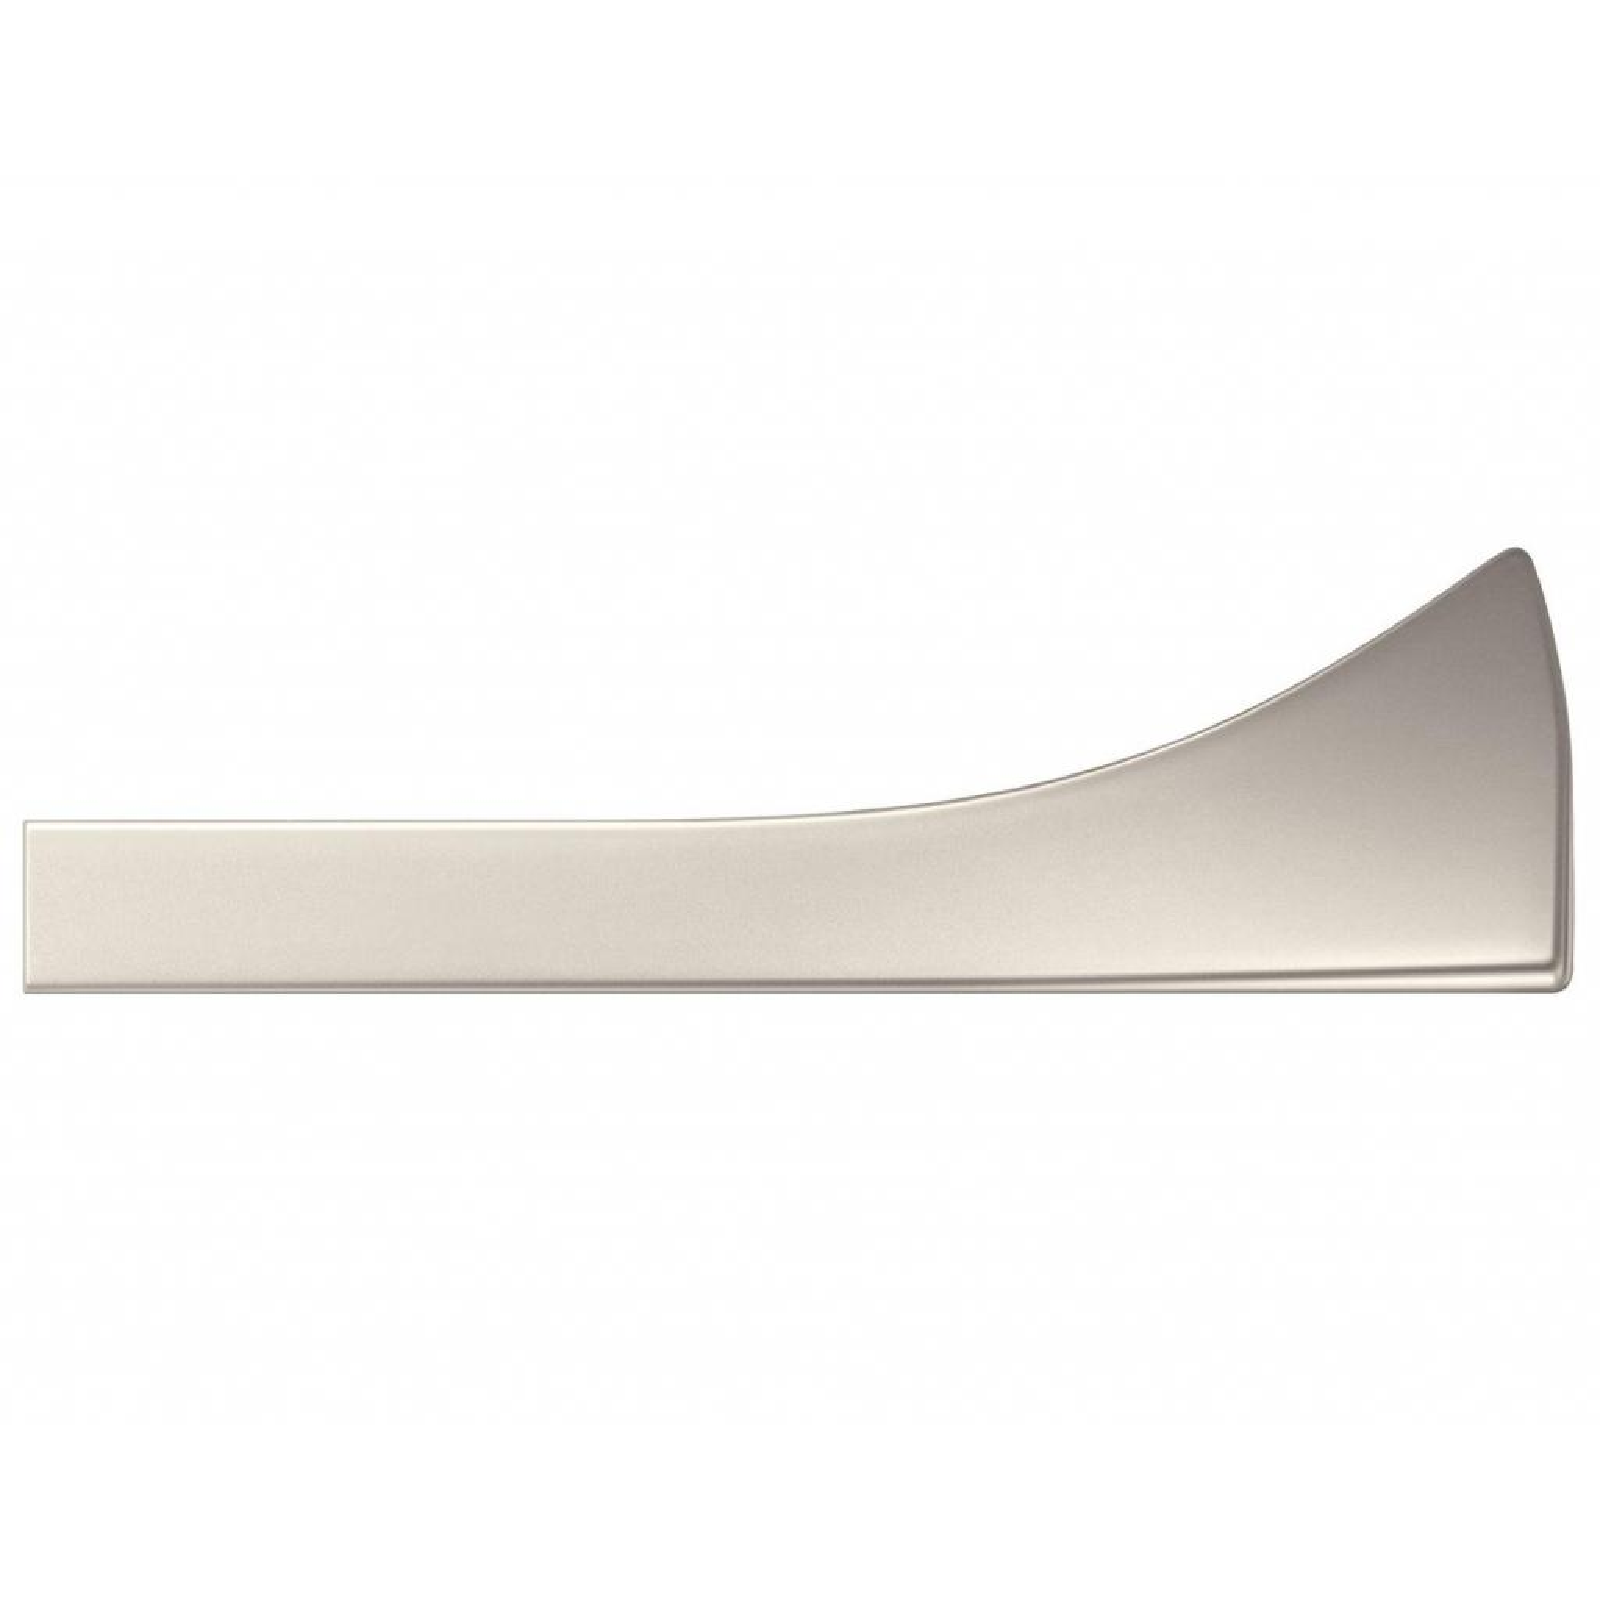 USB флеш накопитель Samsung 64GB Bar Plus Silver USB 3.1 (MUF-64BE3/APC) изображение 6